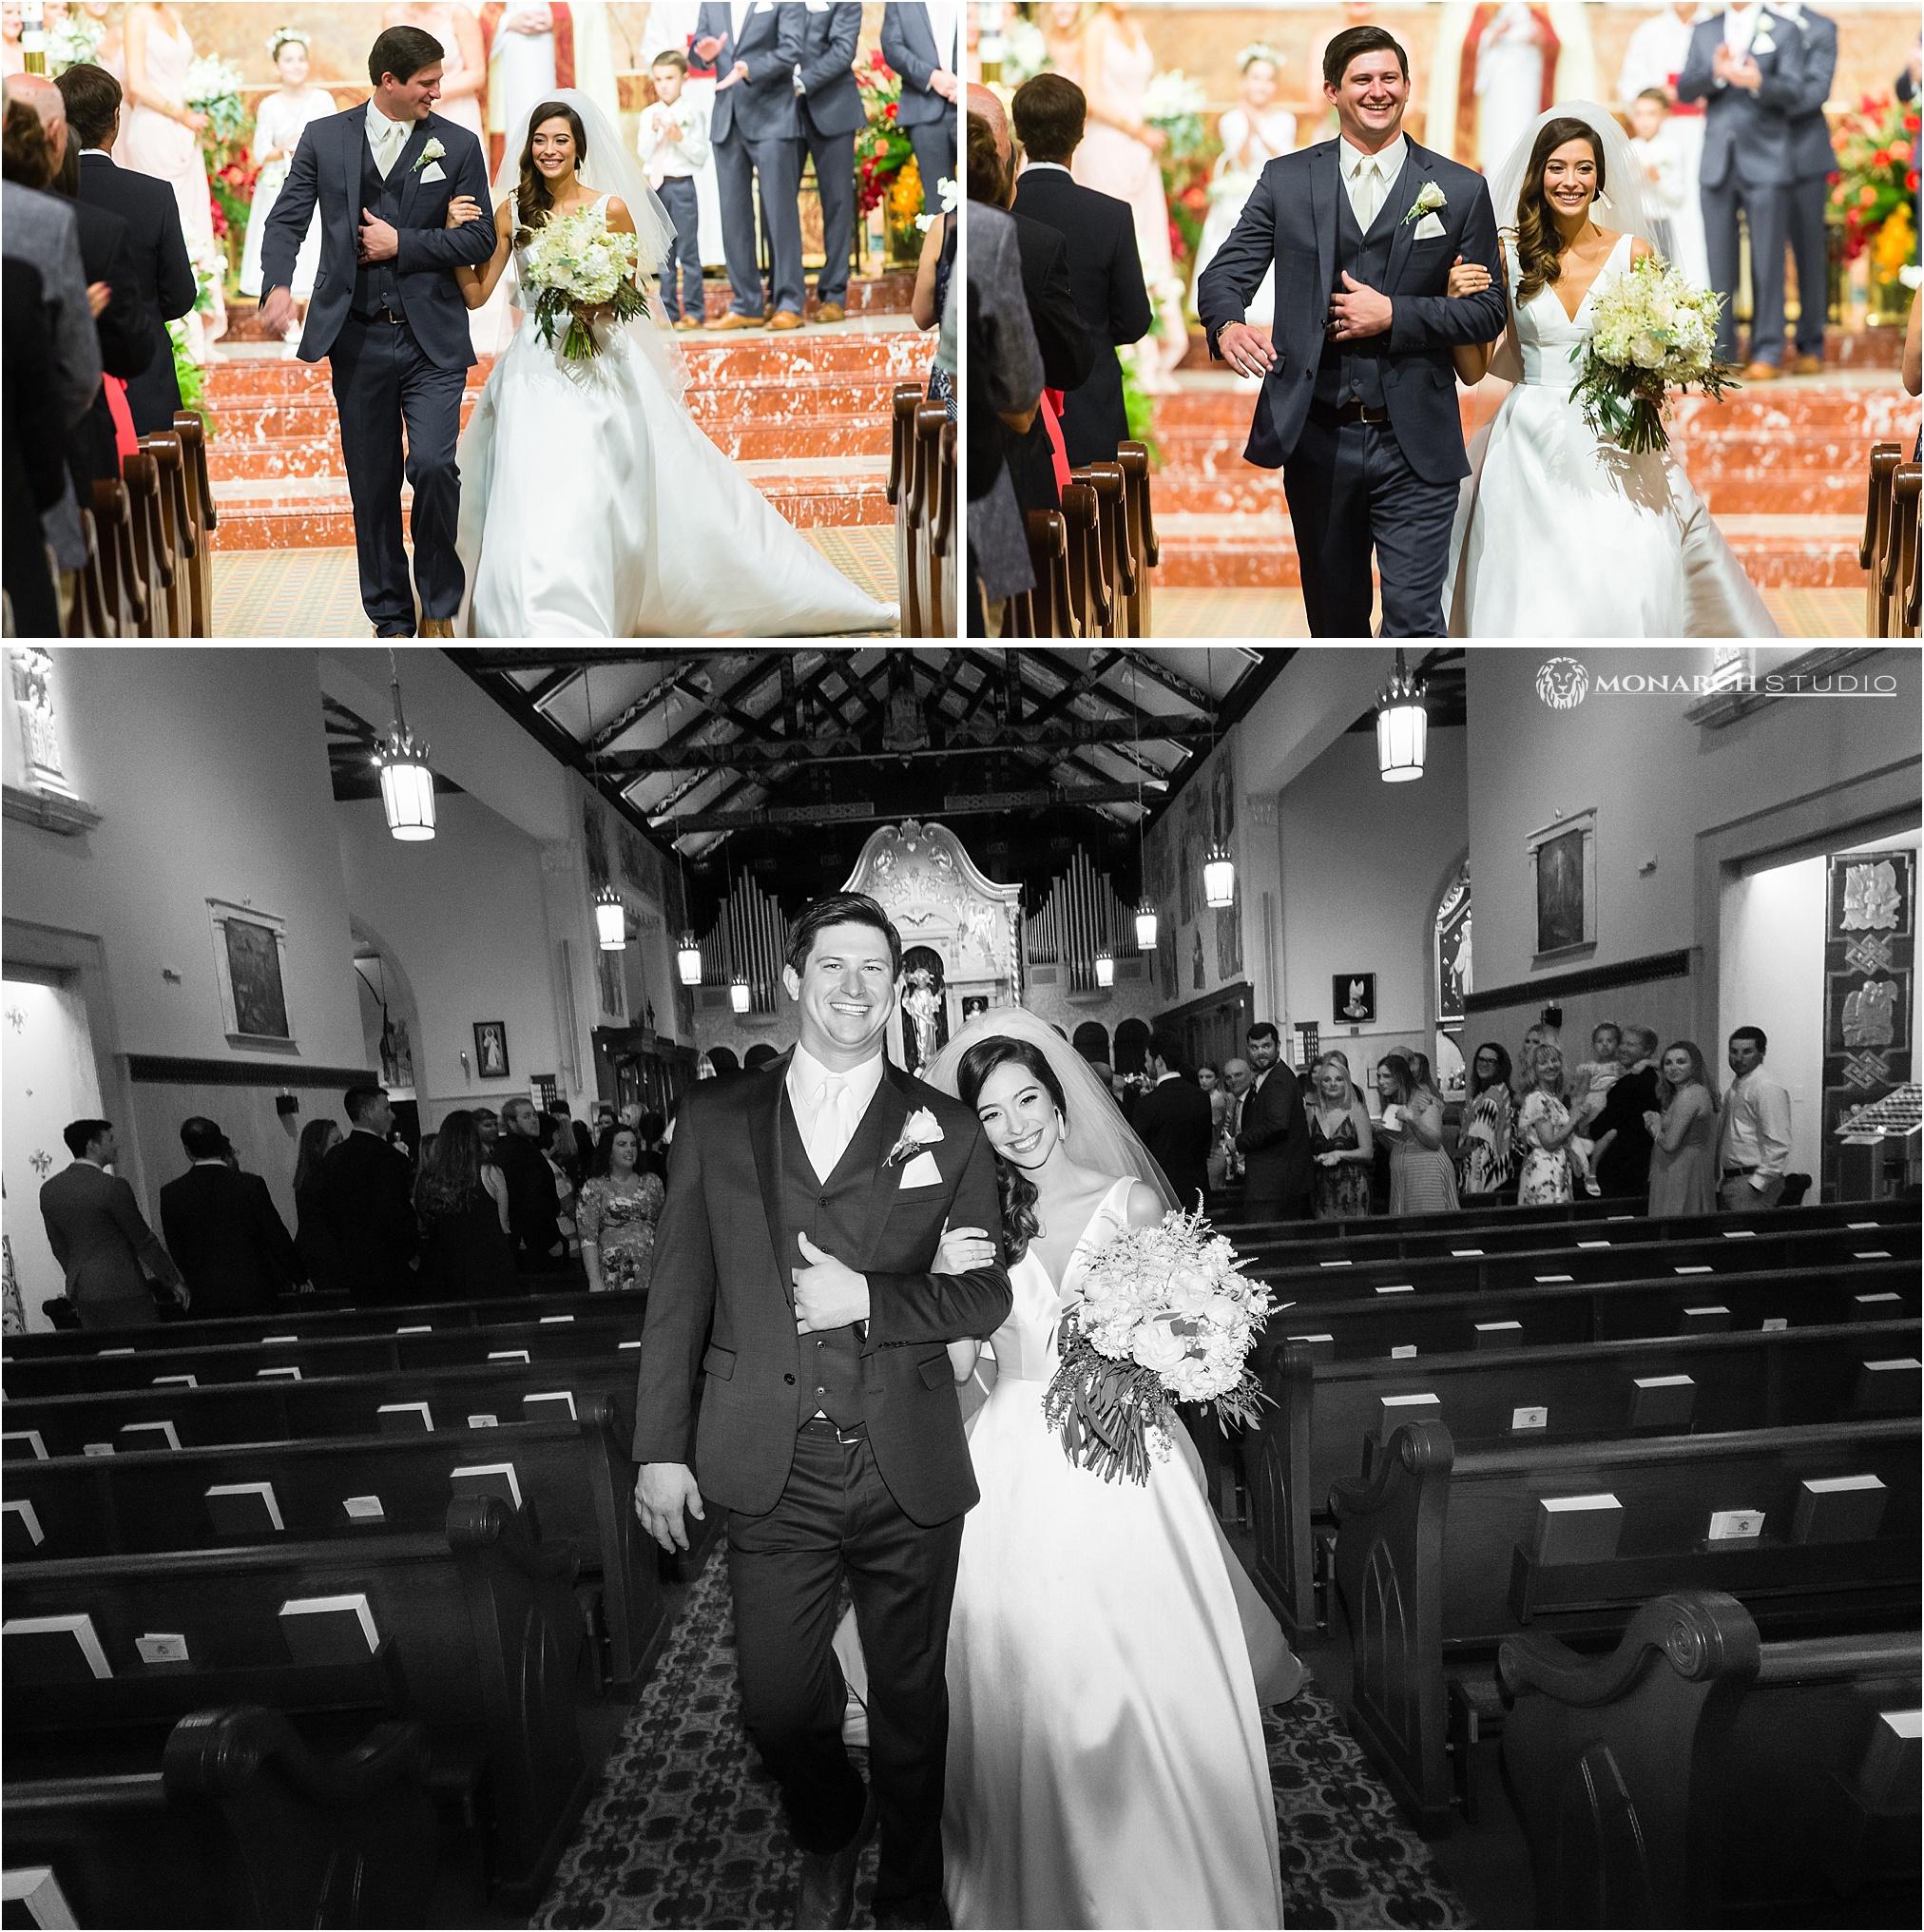 st-augustine-wedding-photographer-075.jpg